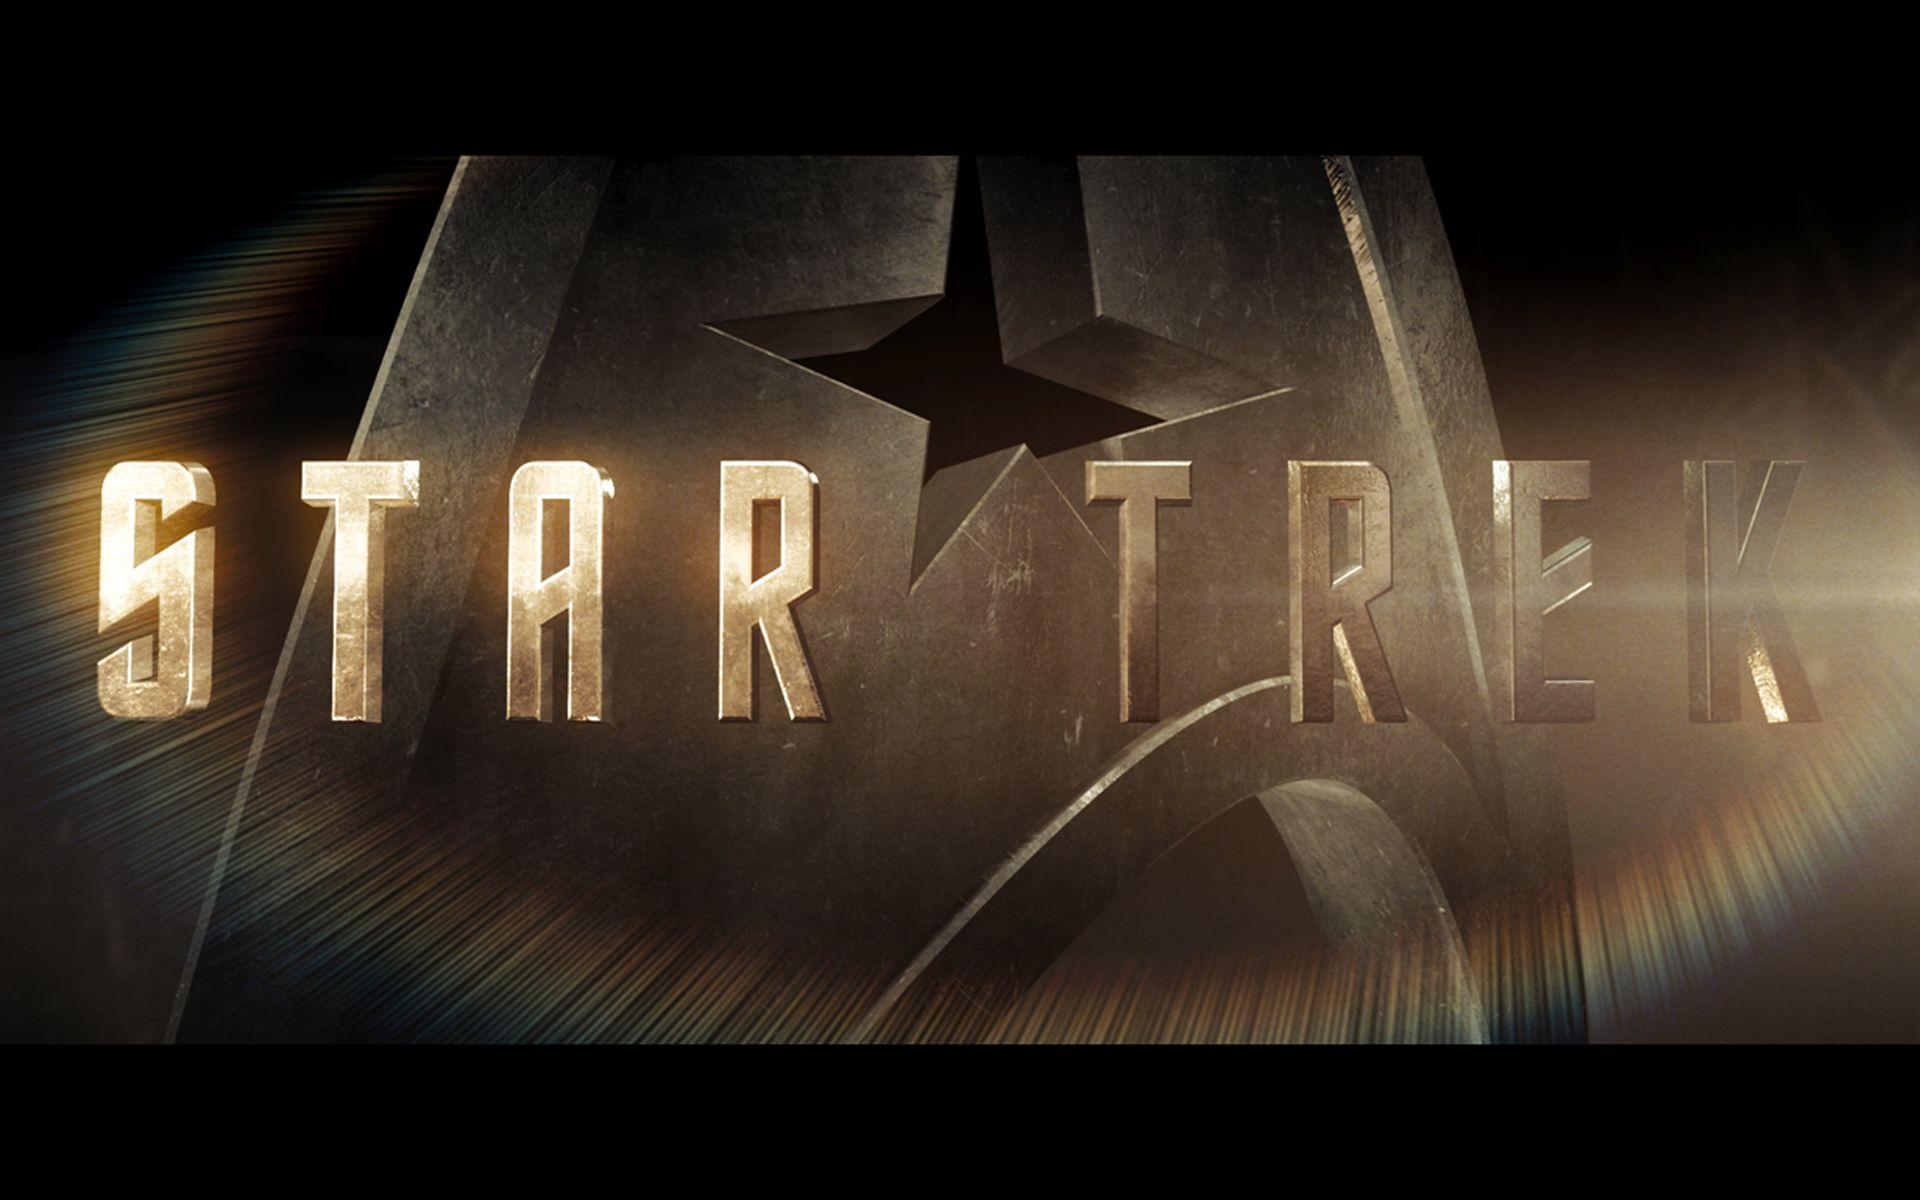 Star Trek 2009 Title Logo Wallpaper 1920x1200